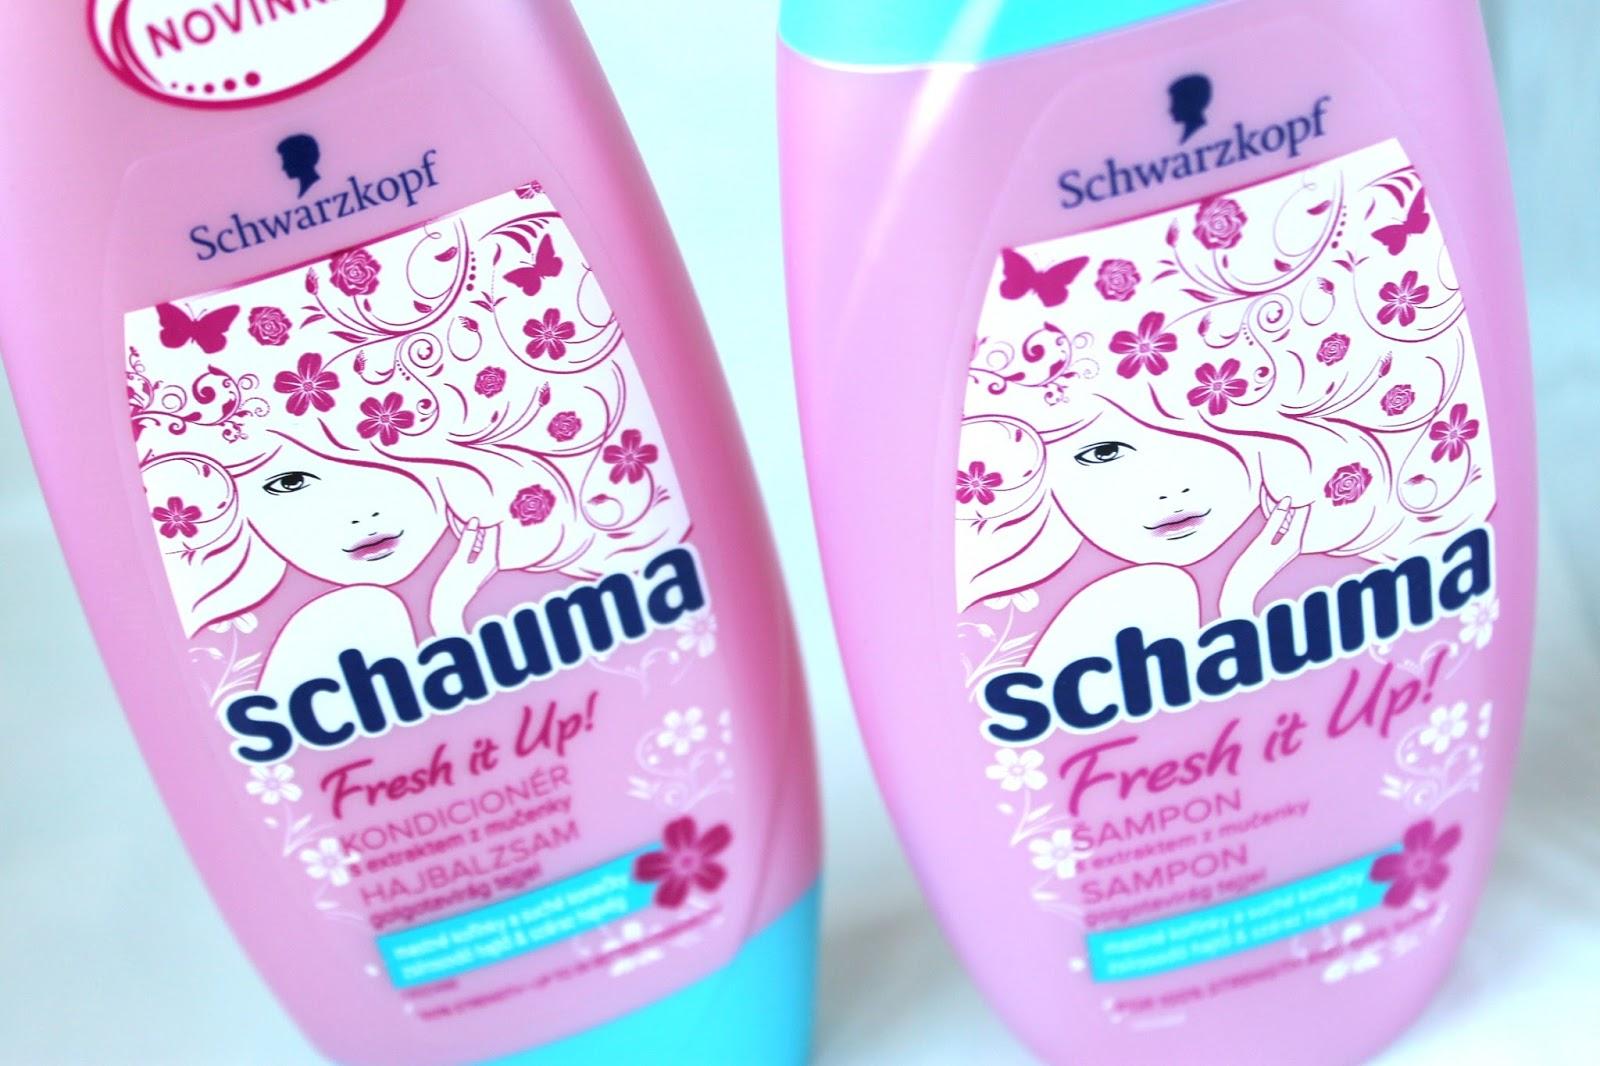 Schauma Fresh it Up!